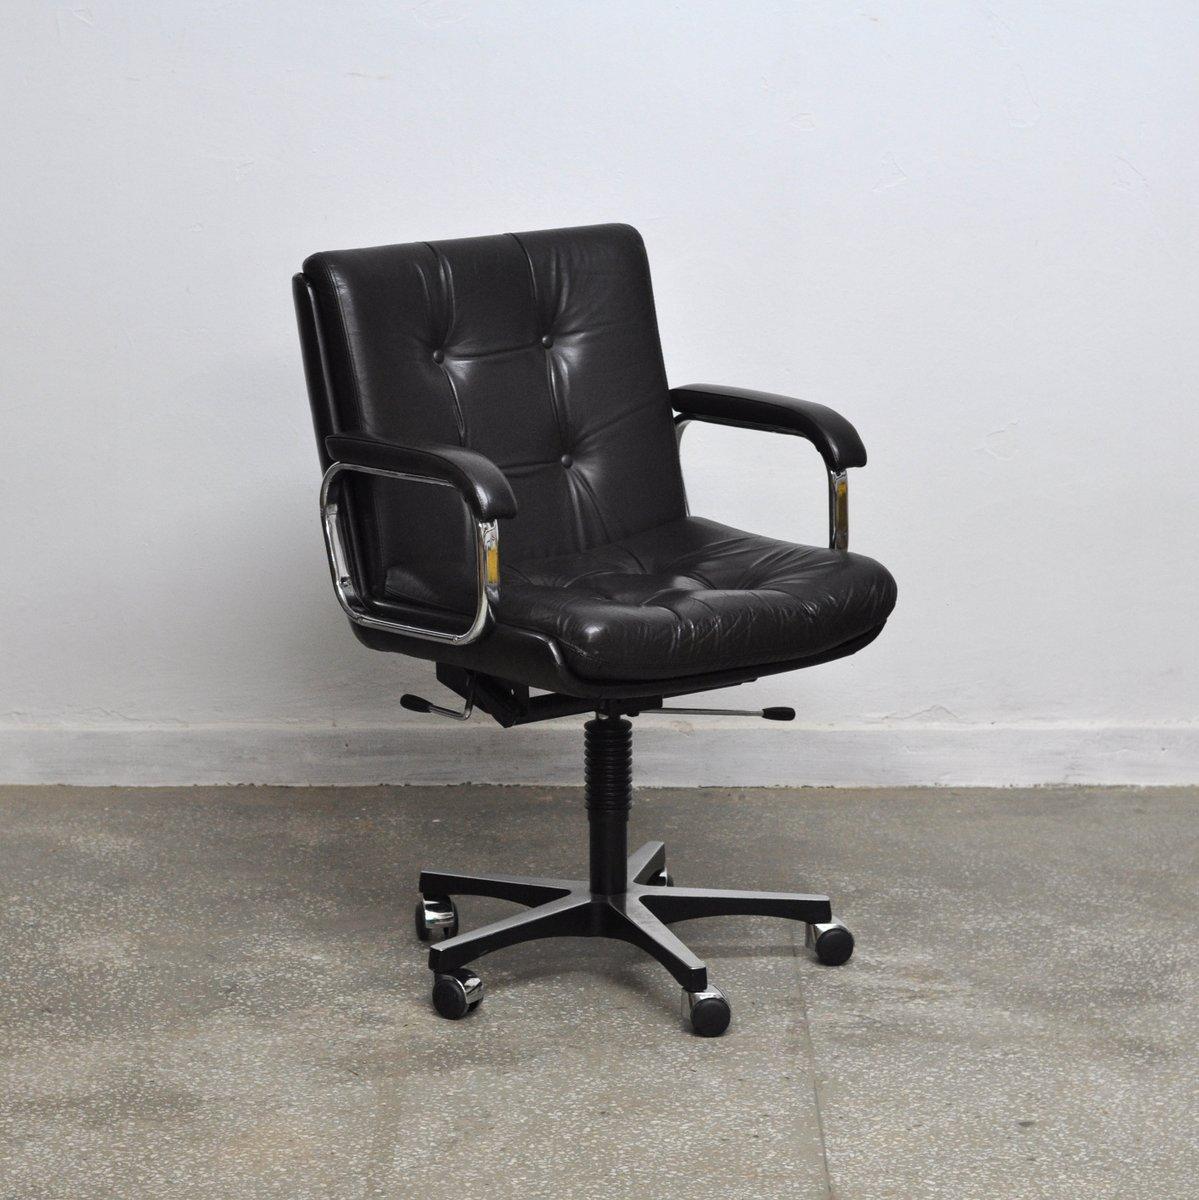 ergonomic chair norway hanging victoria bc vintage norwegian office from ring mekanikk for sale